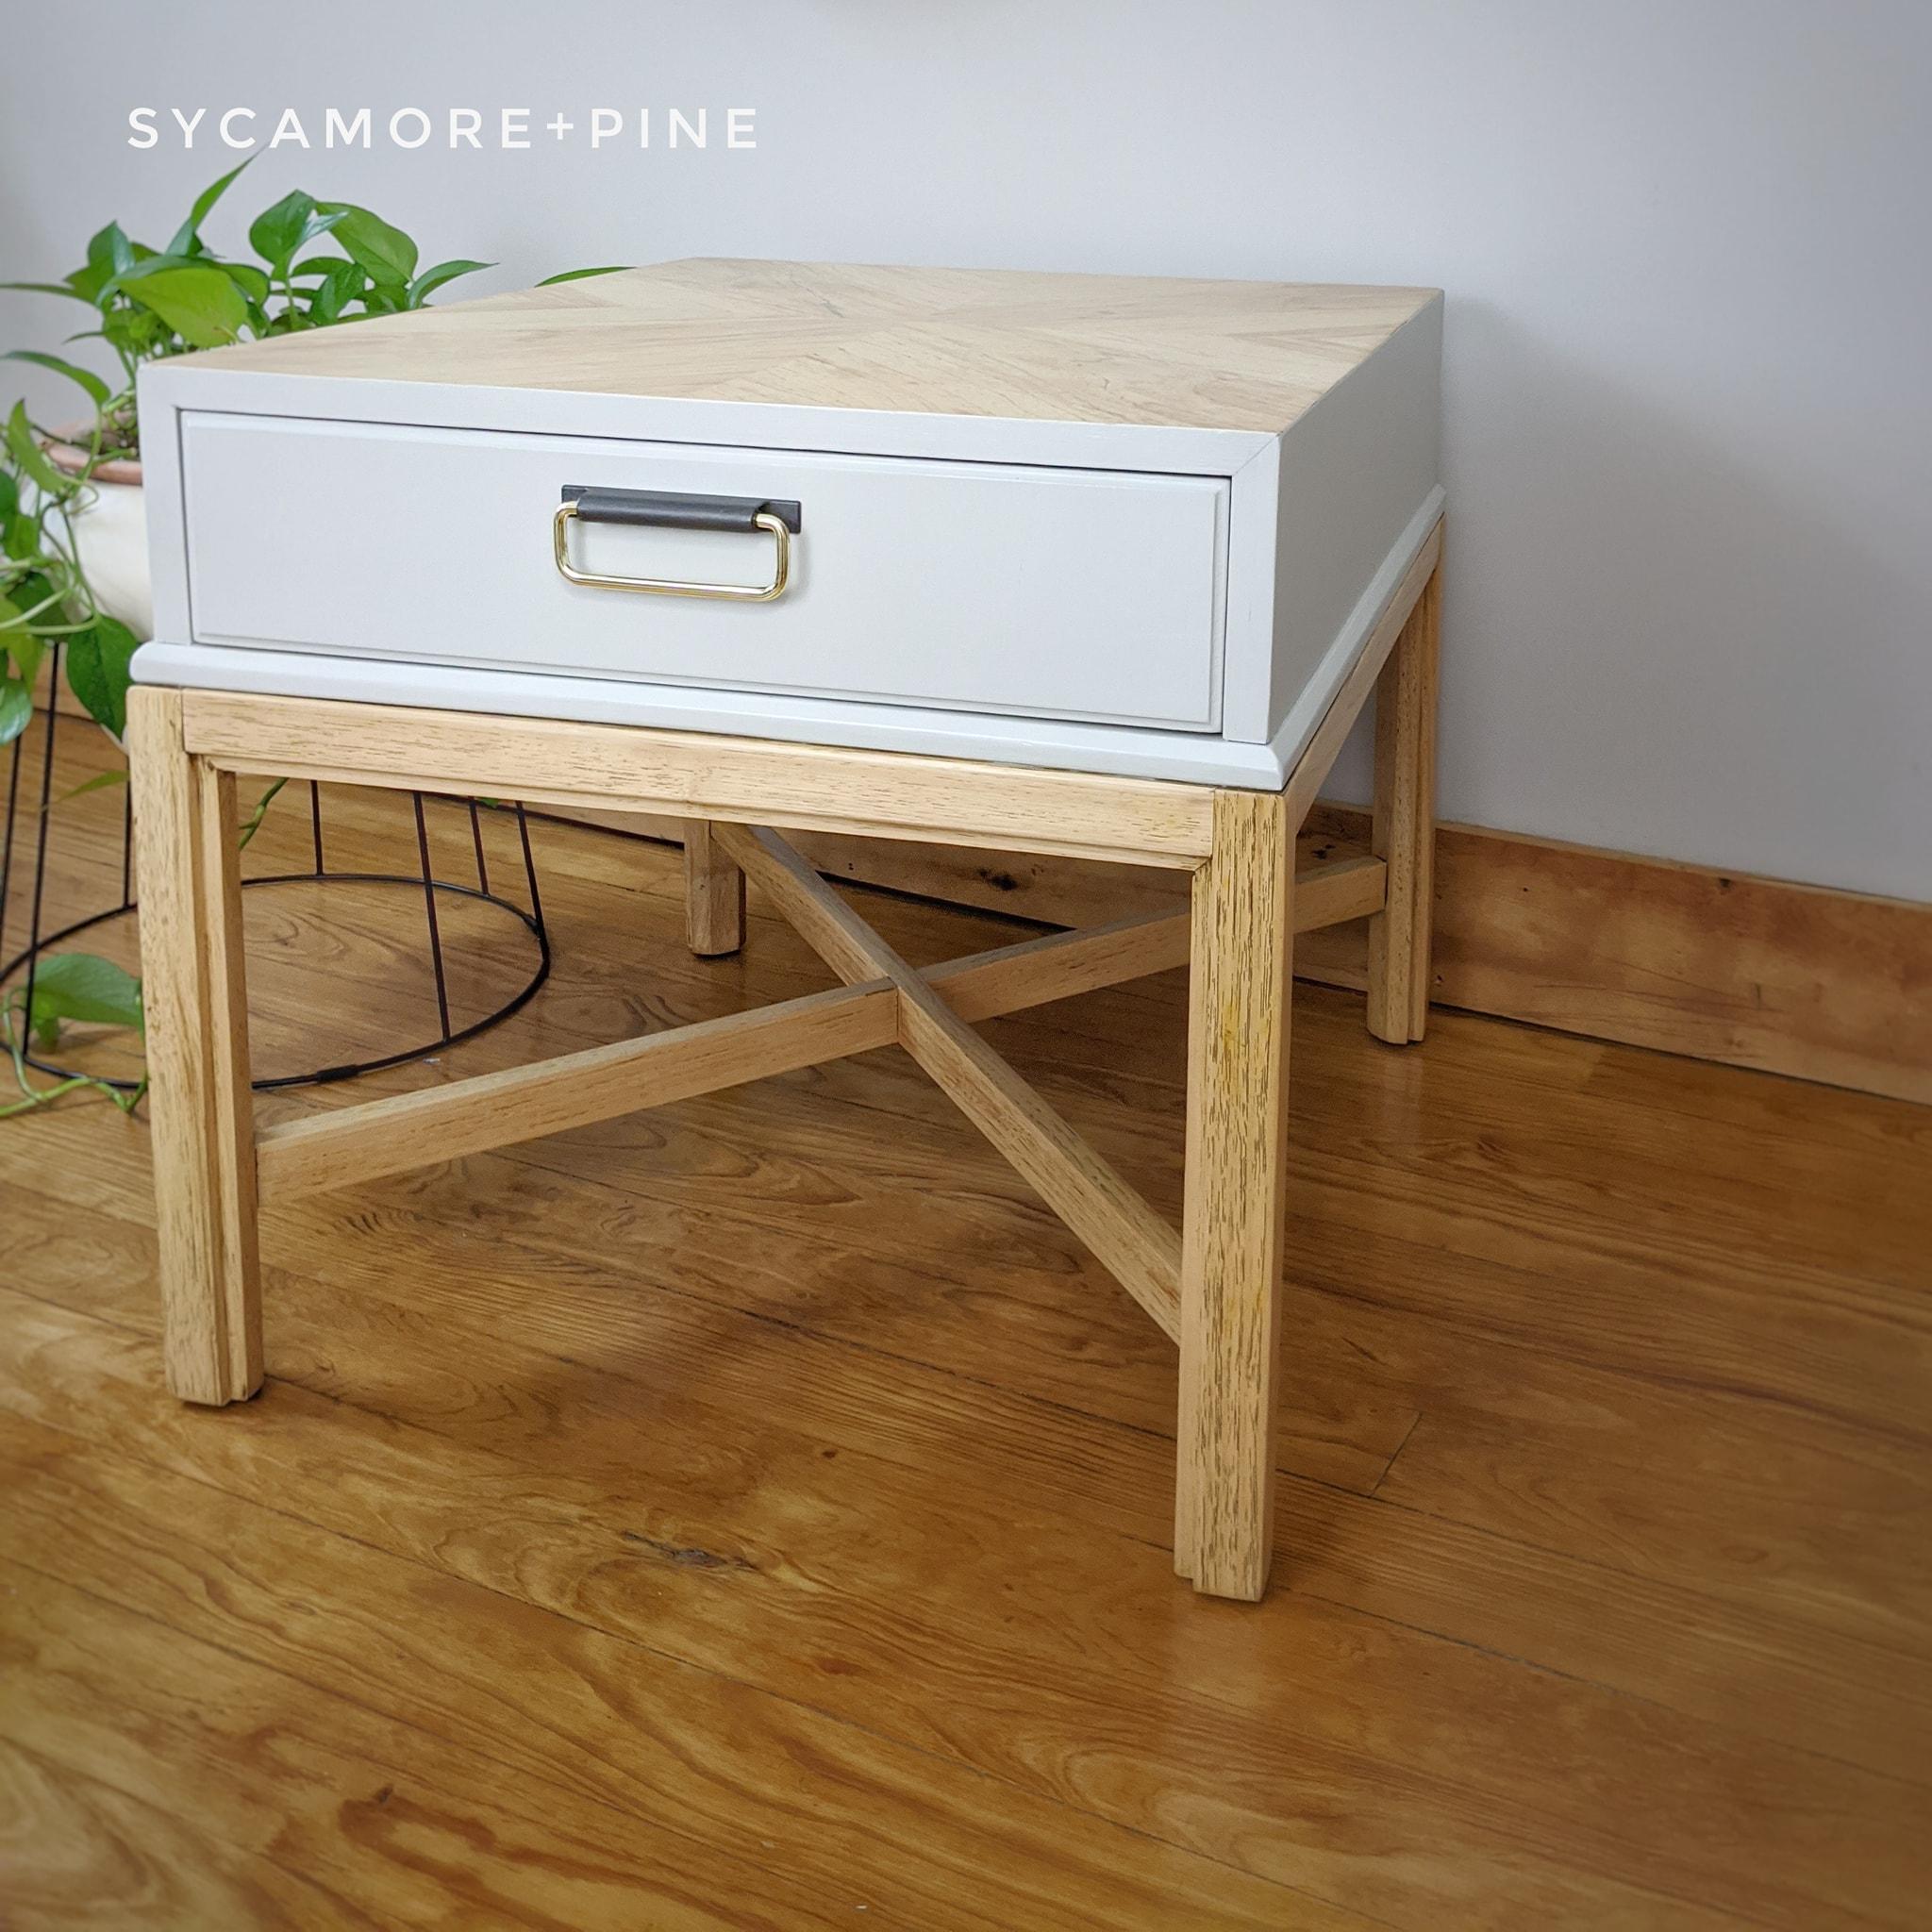 Drexel Table